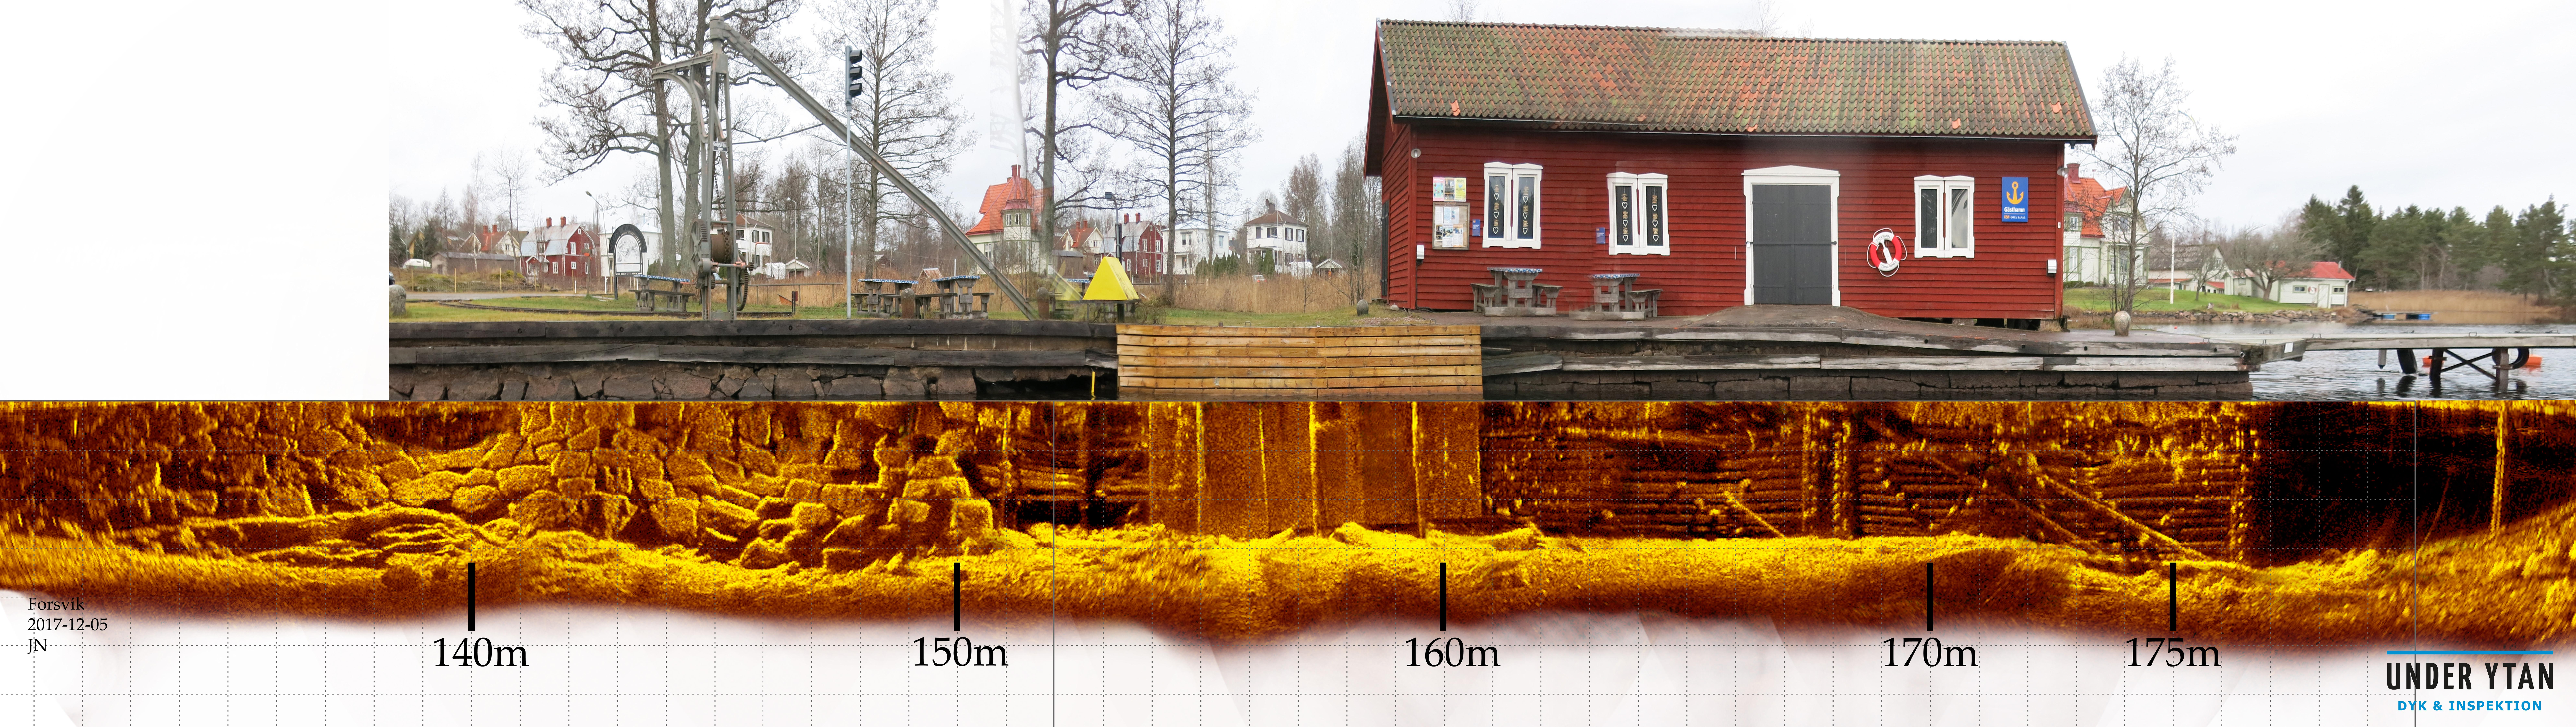 Exempelbild Kajvy - Forsvik N sidan